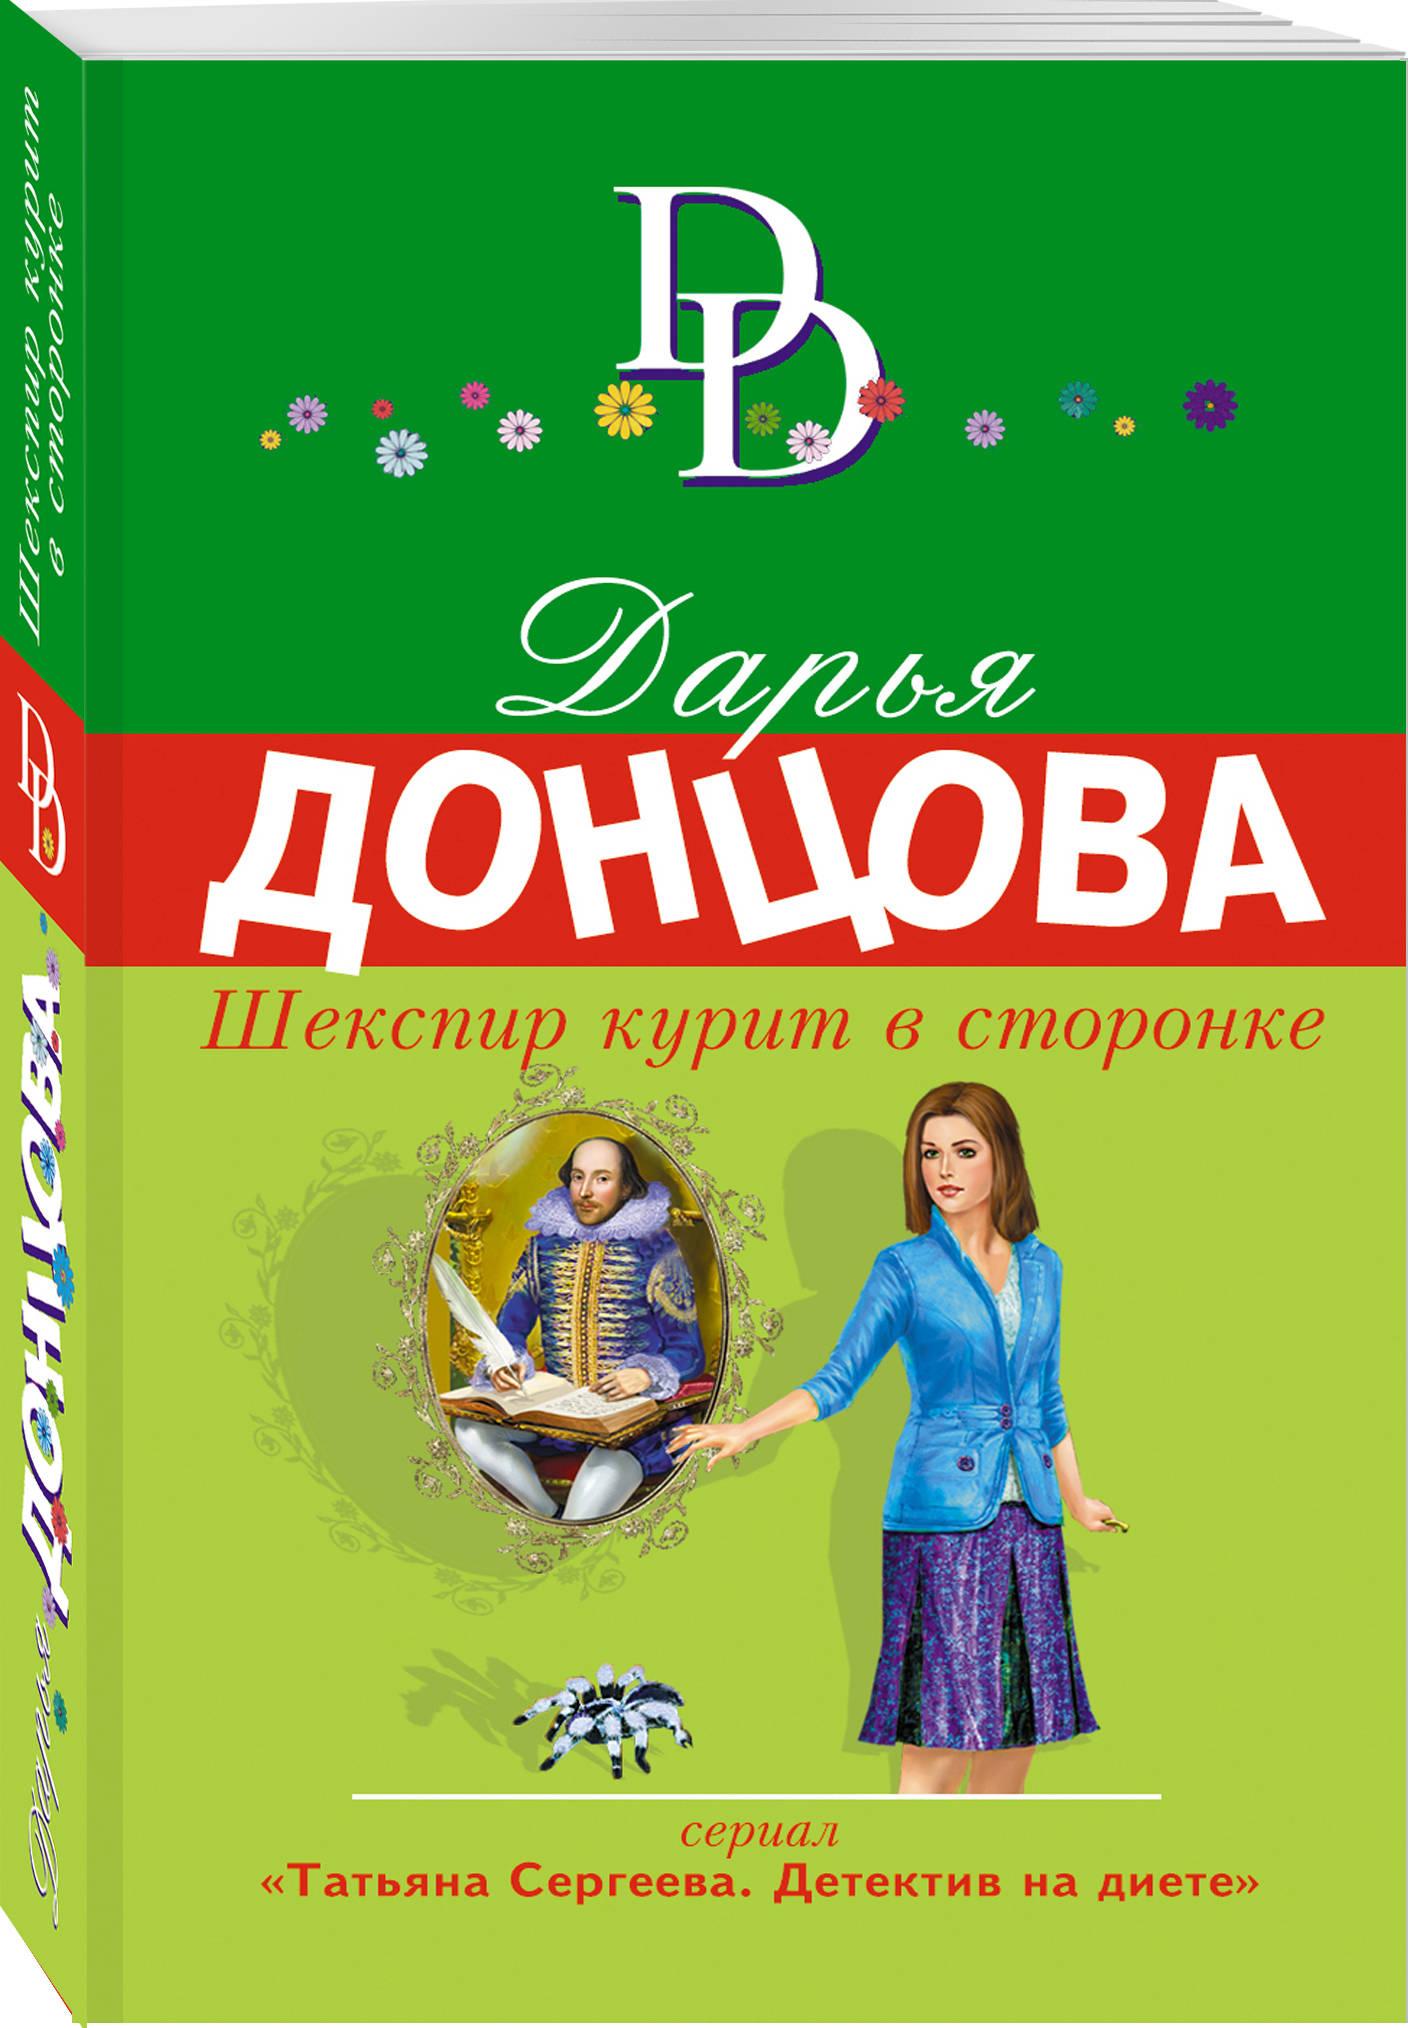 Донцова Дарья Аркадьевна Шекспир курит в сторонке